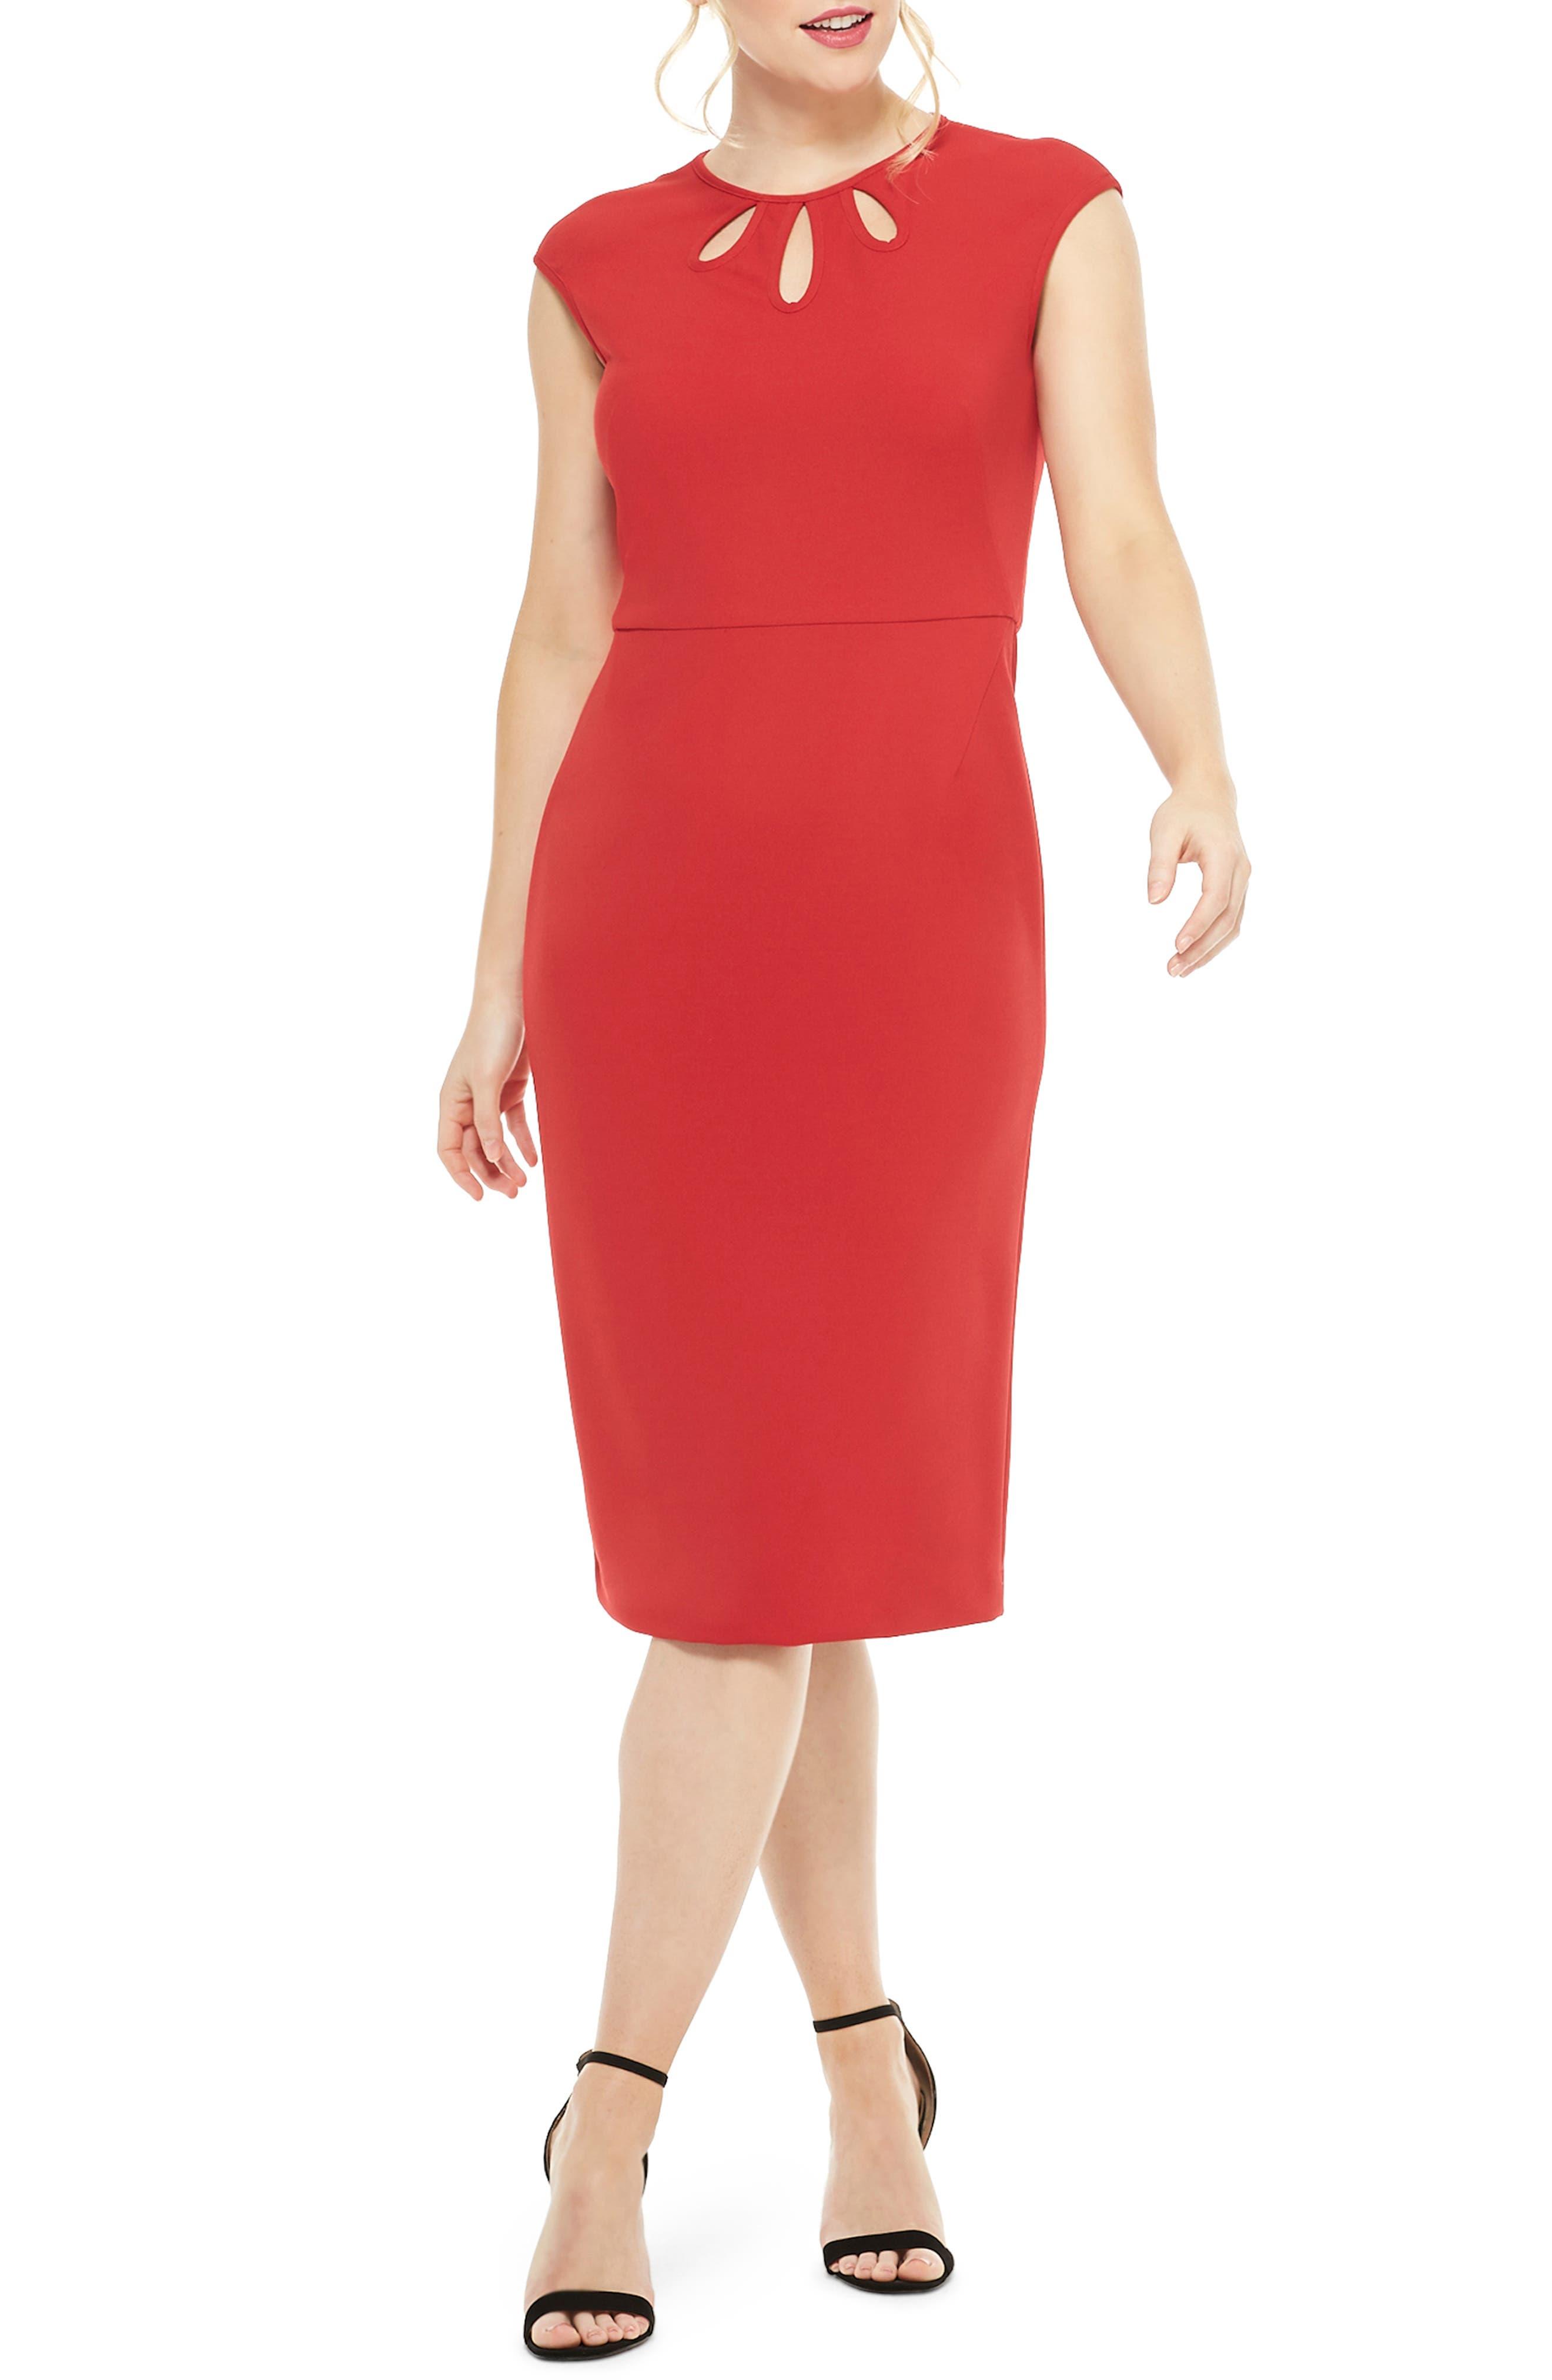 Maggy London Teardrop Jewel Neck Scuba Crepe Dress, Red